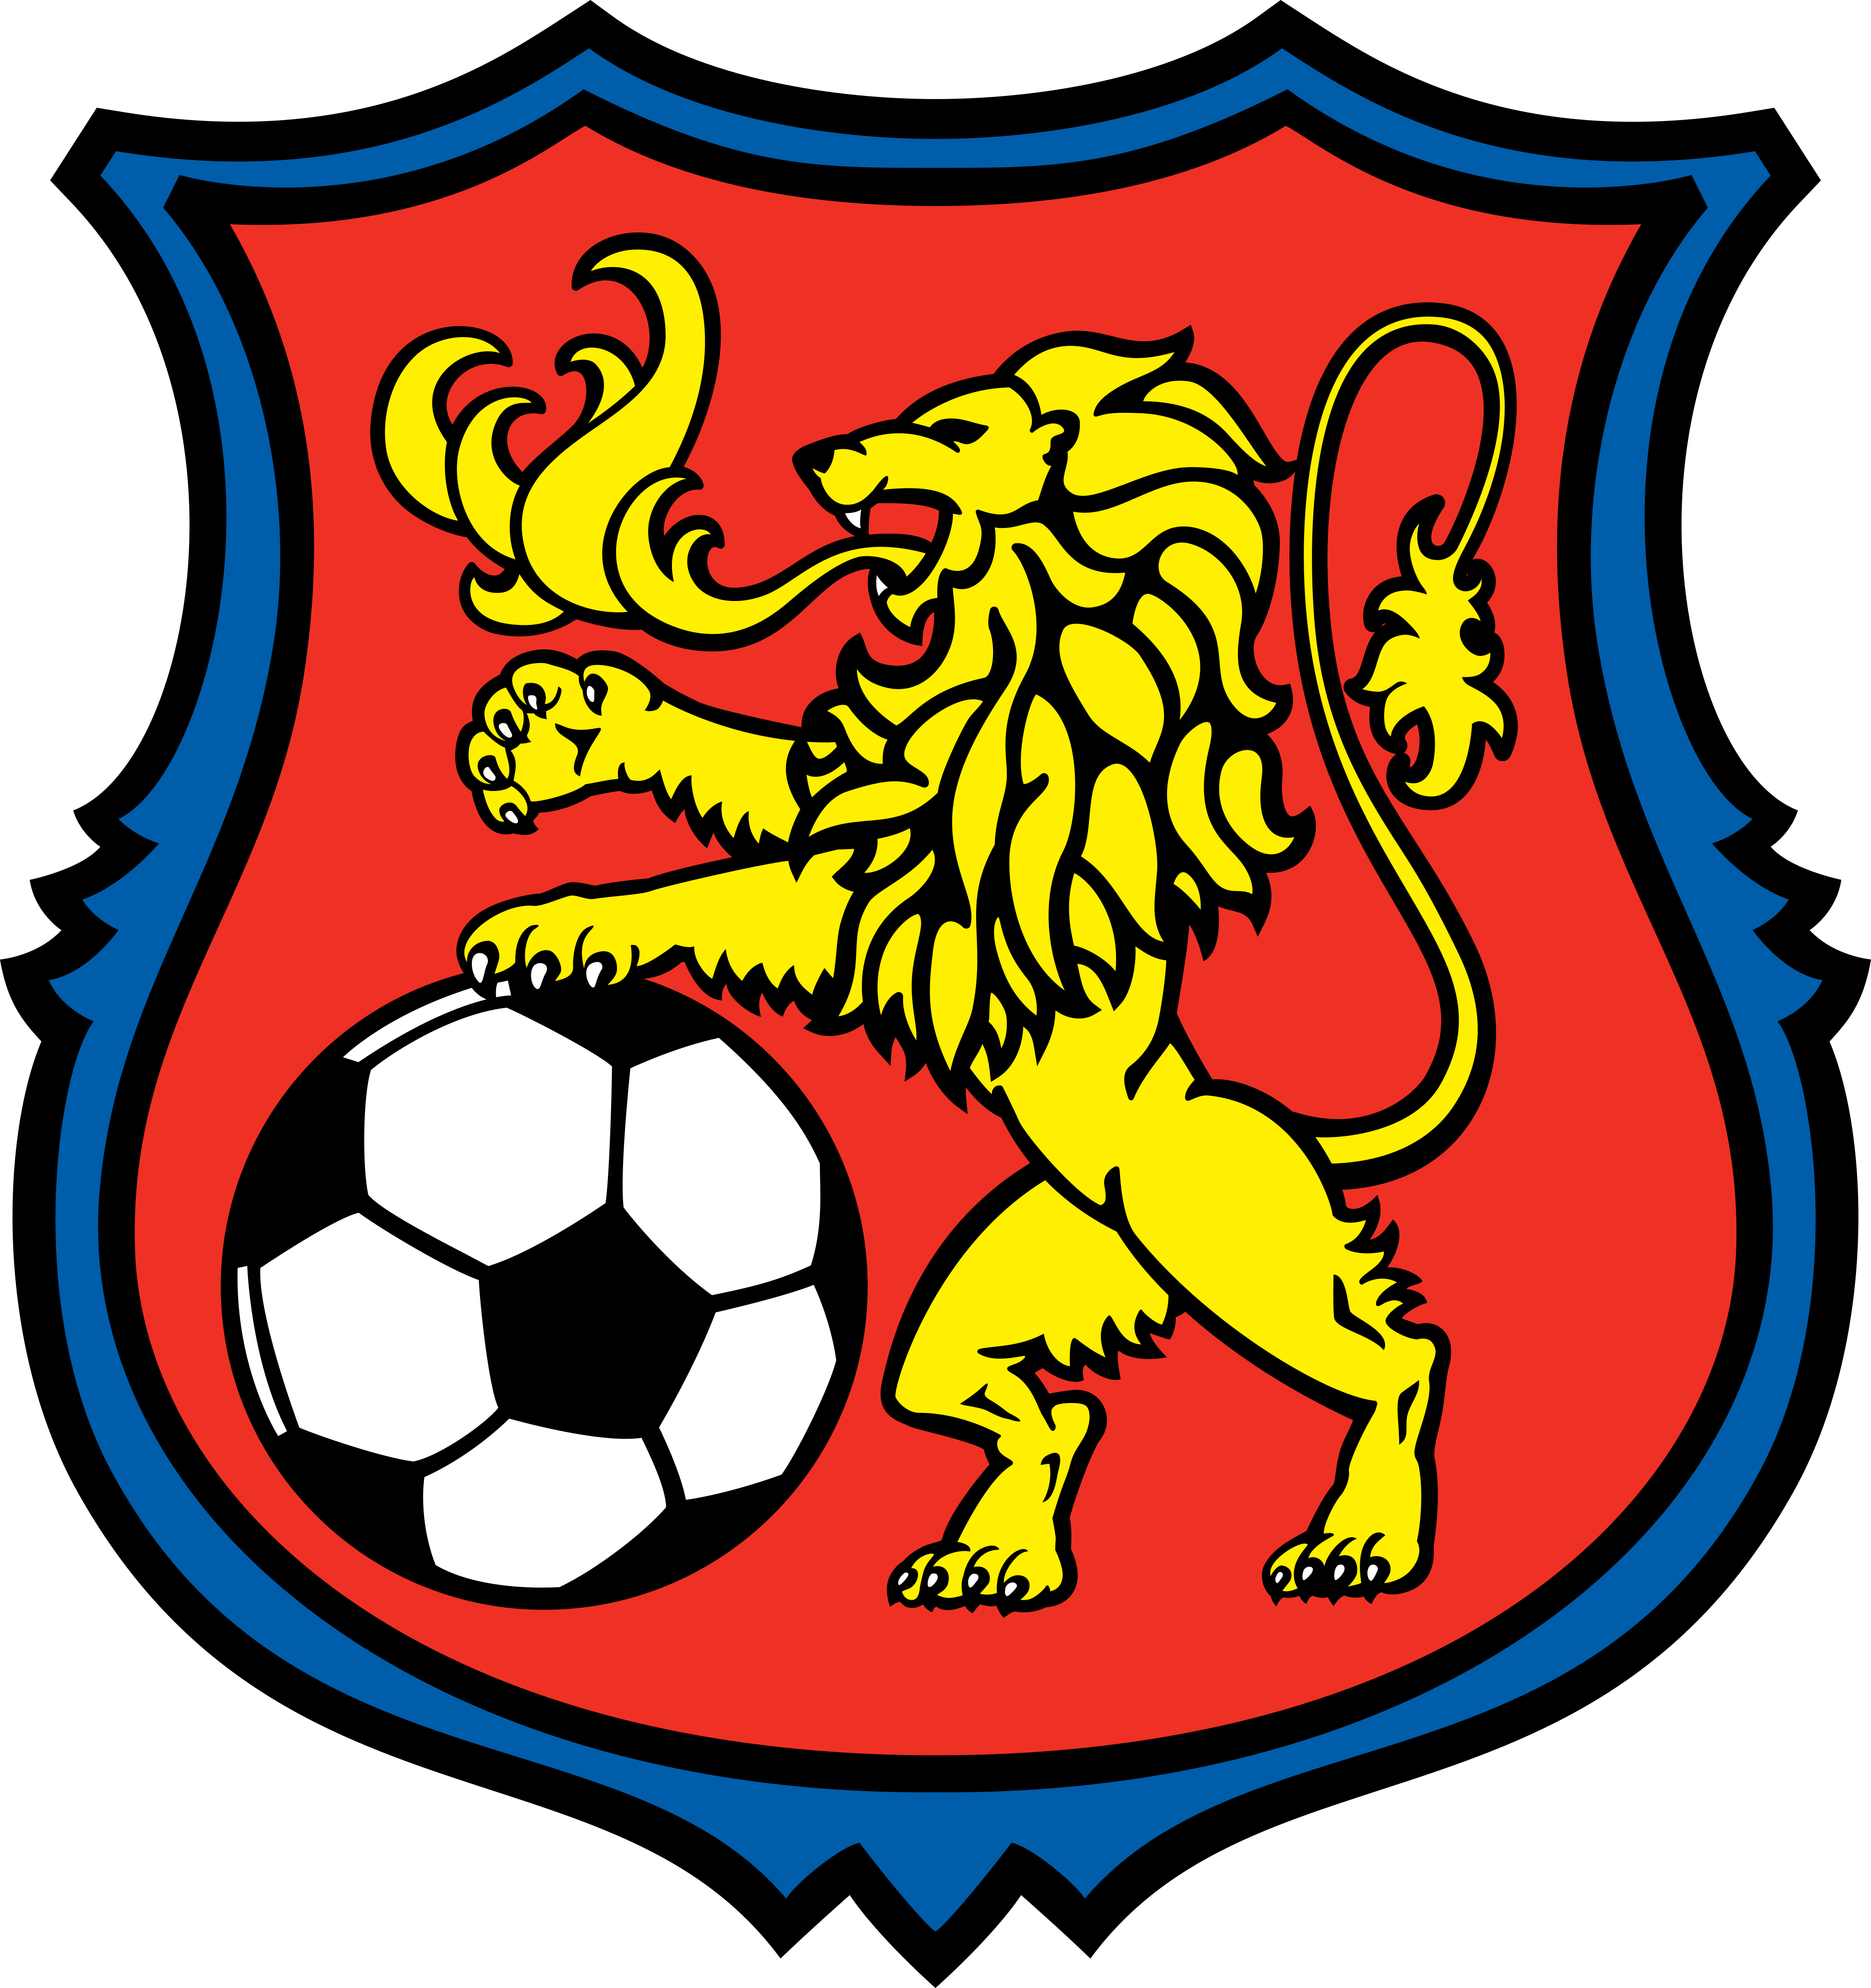 caracas fc logo 1 - Caracas FC Logo